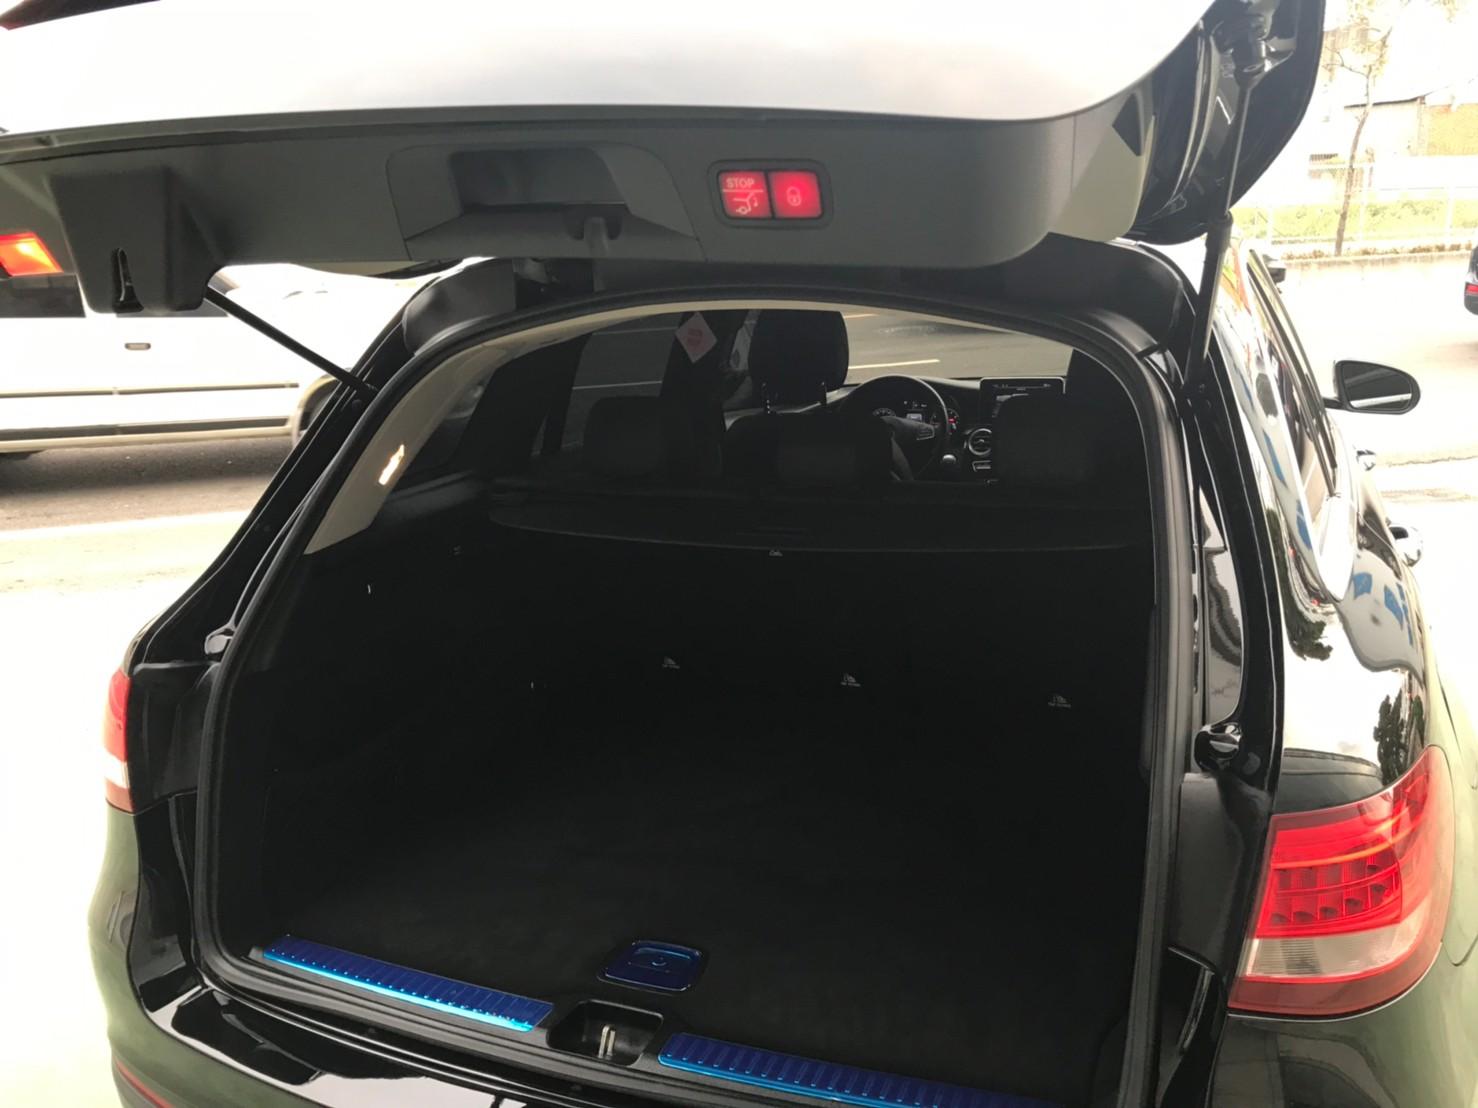 2016GLC300黑SUM138.8 盲點偵測 i-key摸門 電尾門 大影幕 後冷 記憶座椅_210511_9